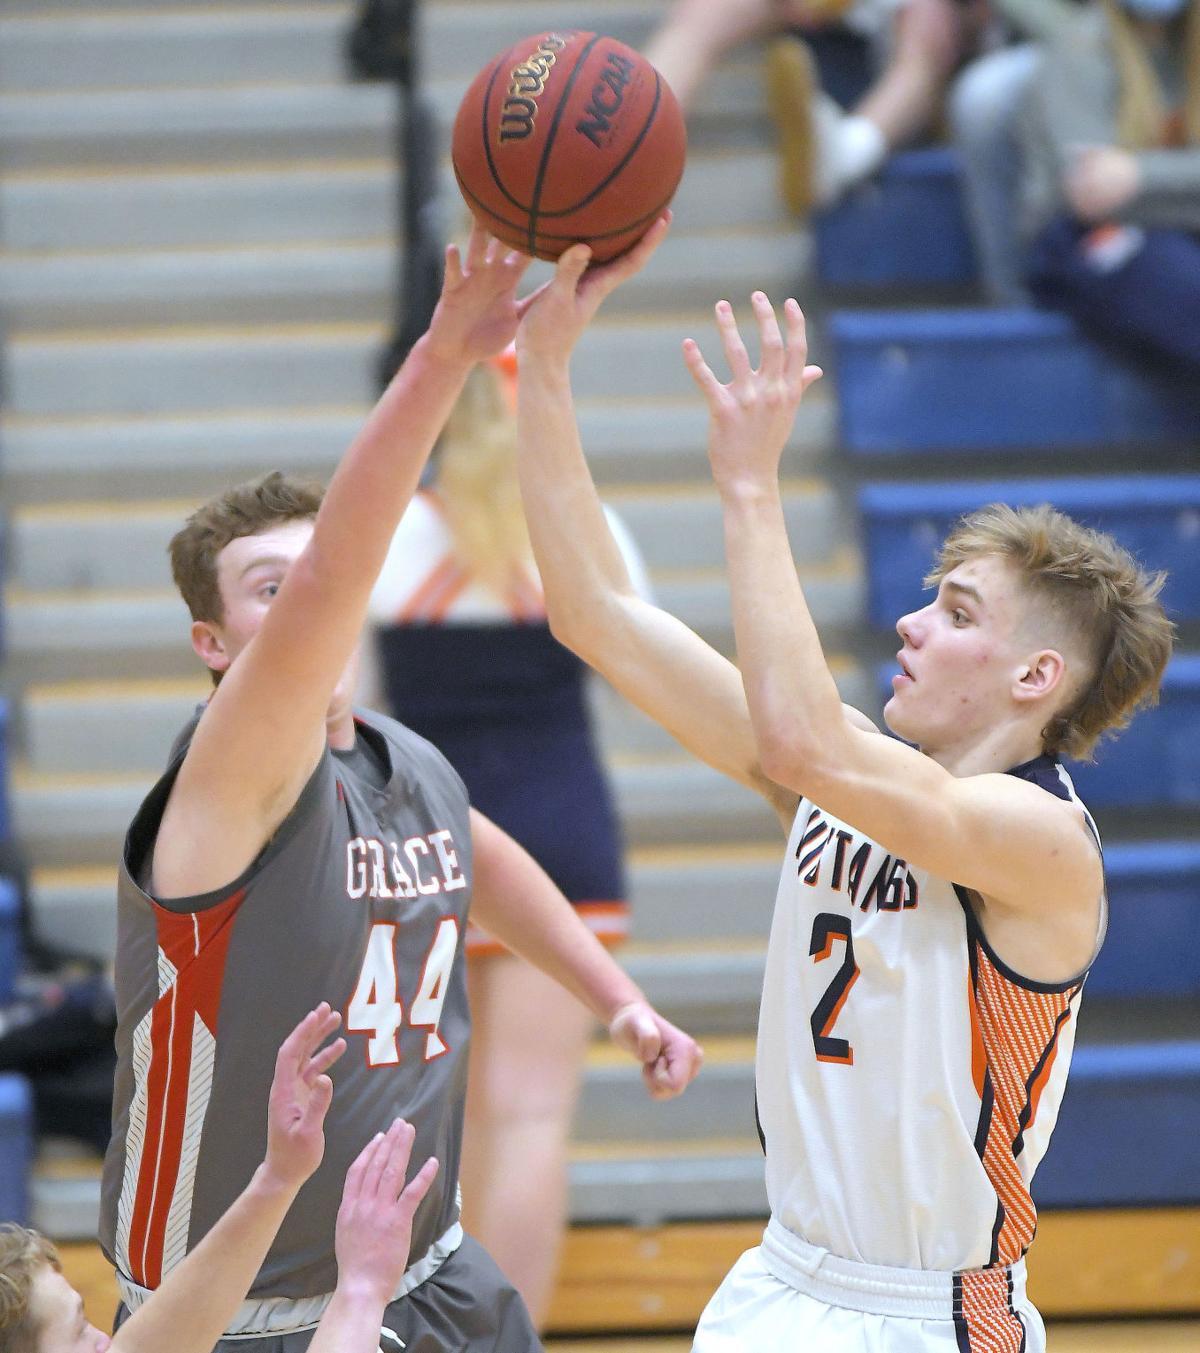 mountain crest grace basketball SECONDARY